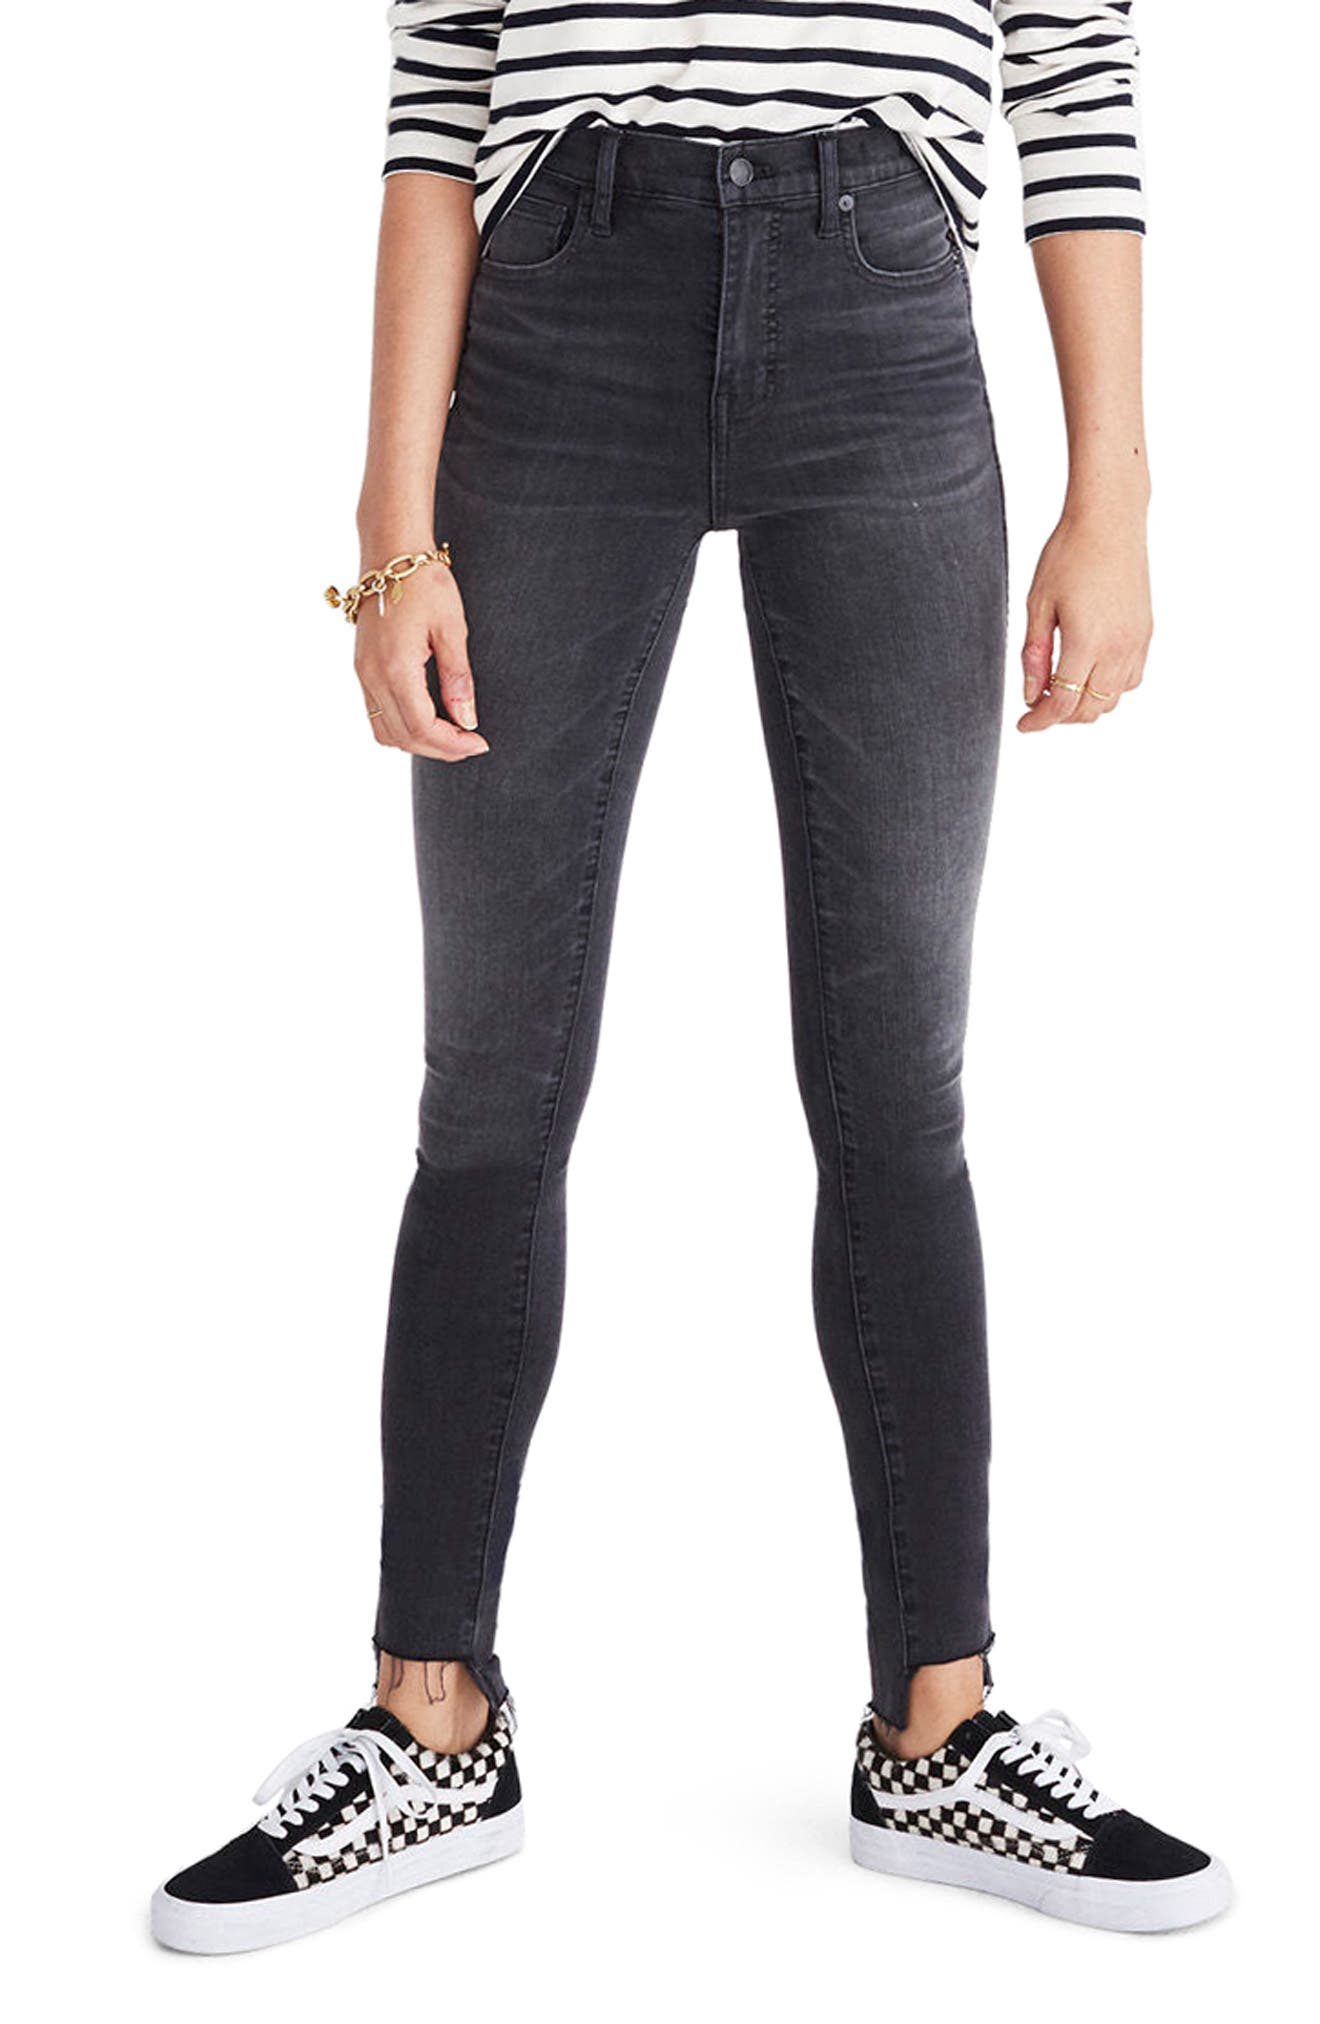 Alternate Image 1 Selected - Madewell 10-Inch High Rise Step Hem Skinny Jeans (Slater Wash)